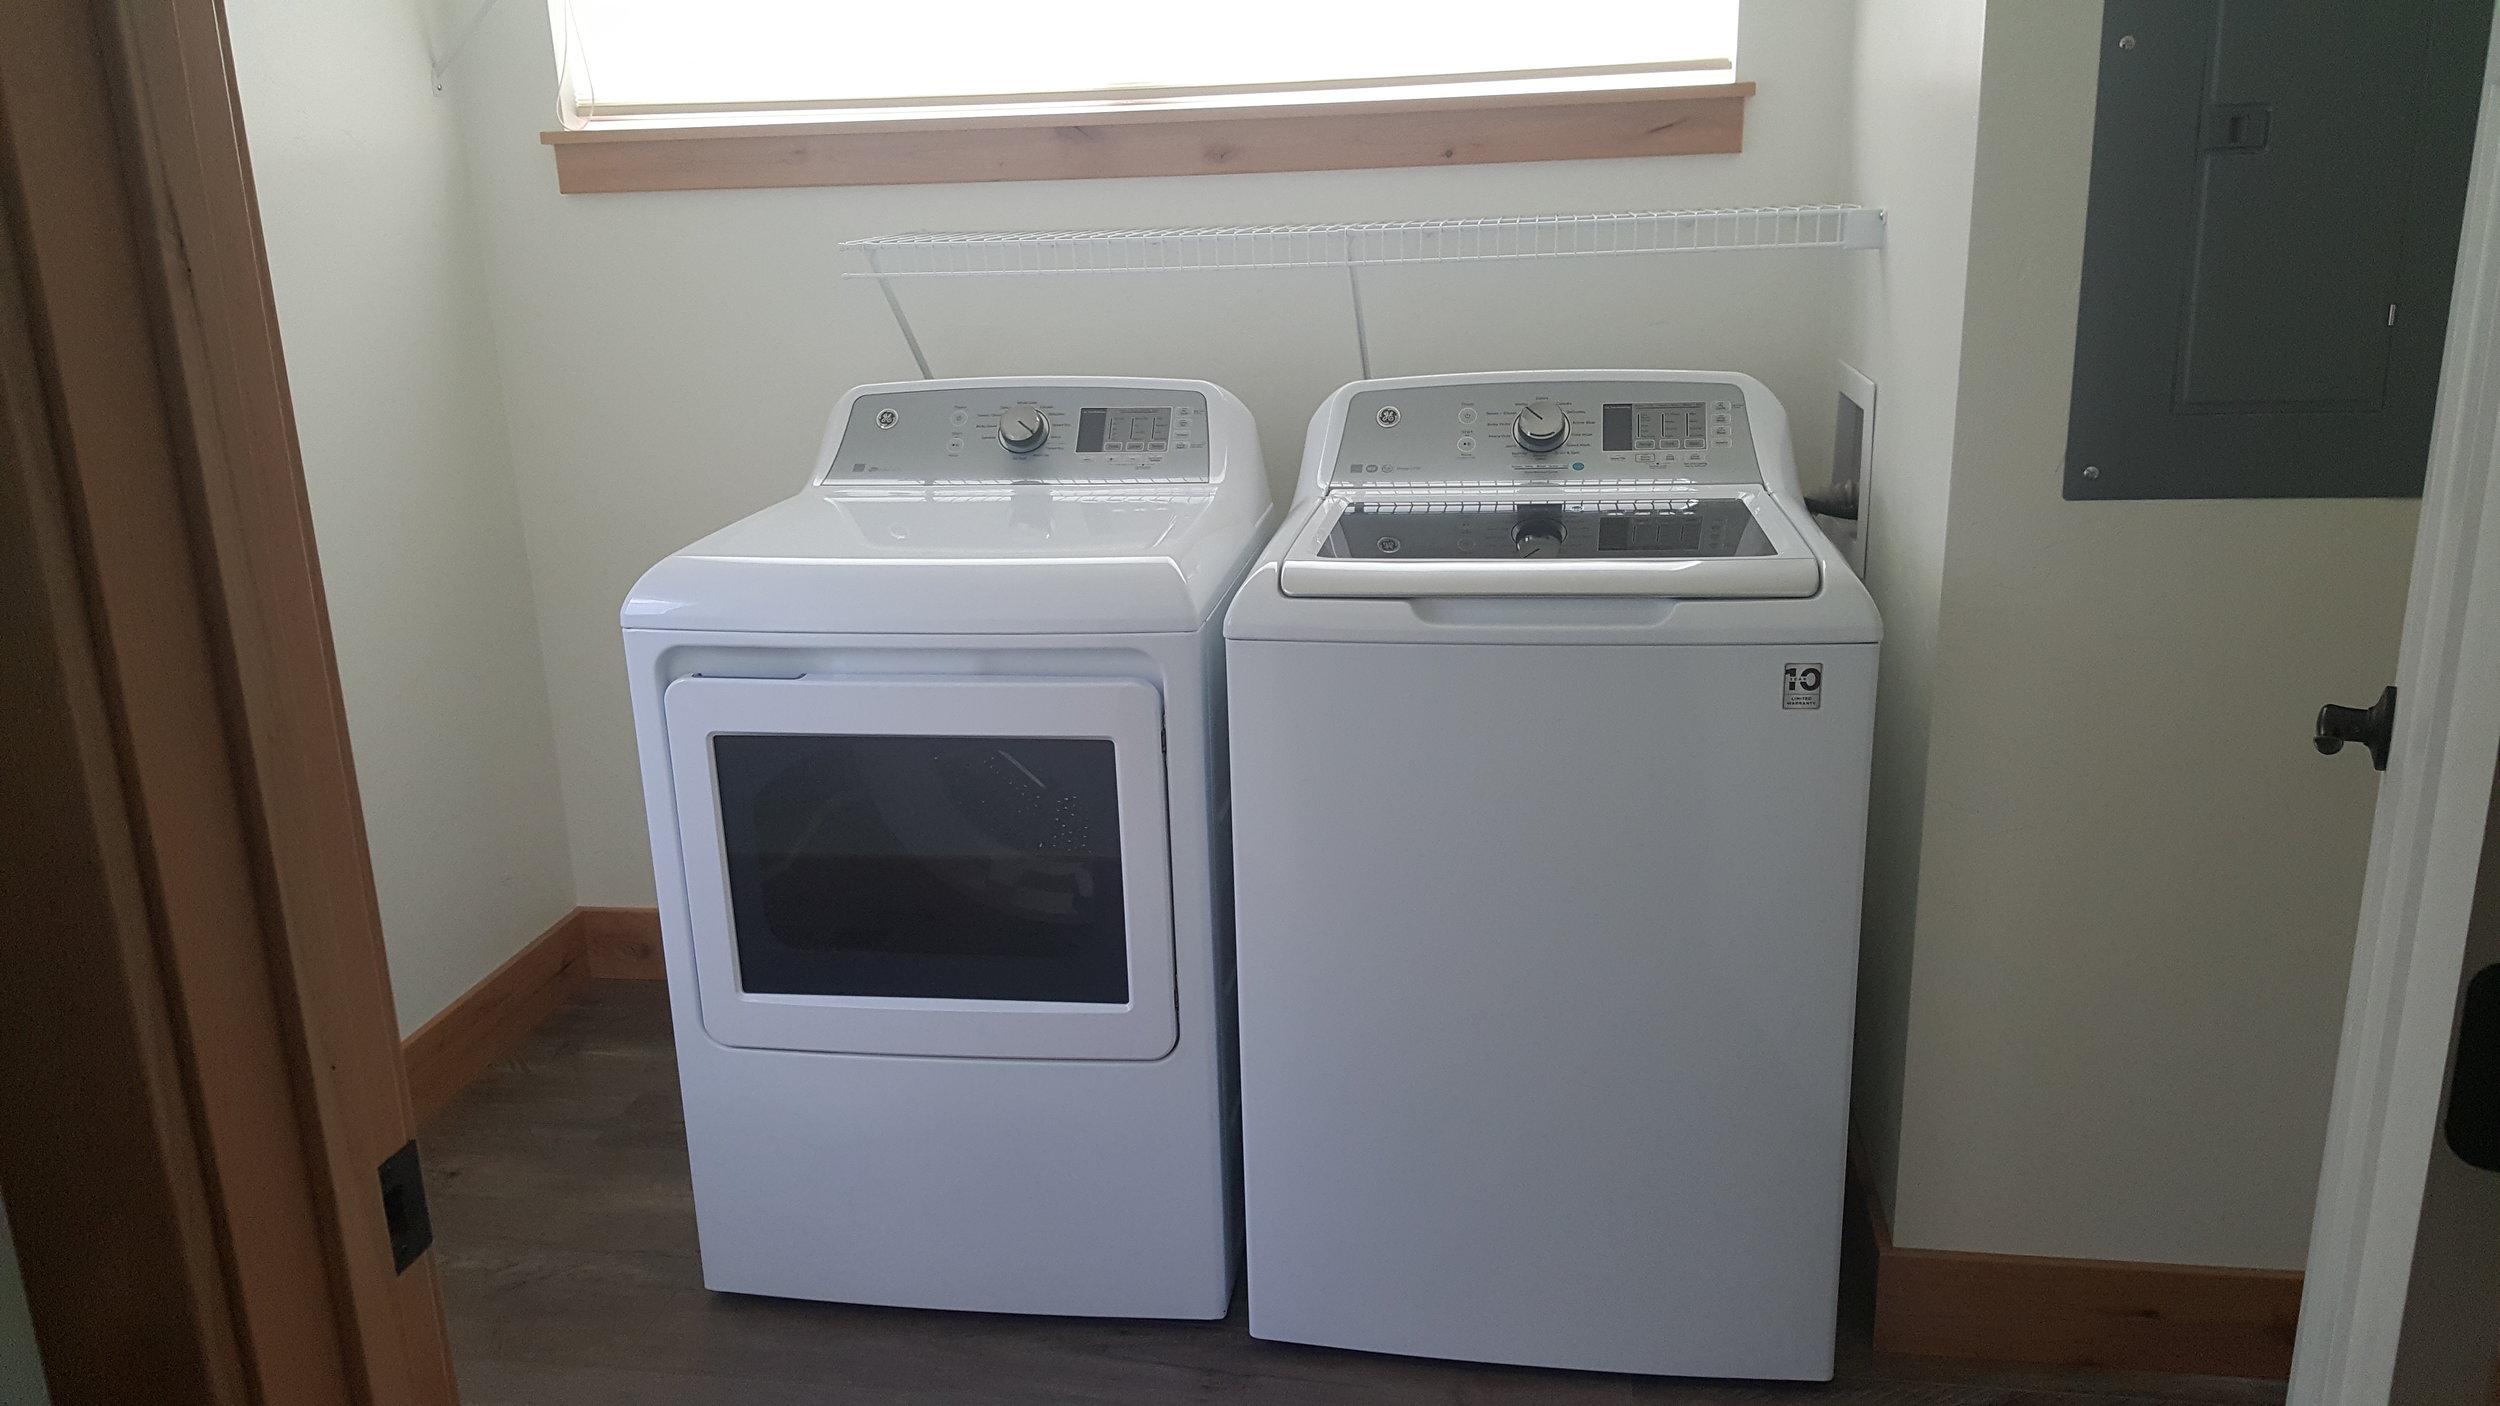 828 Woodford wahser and dryer.jpg